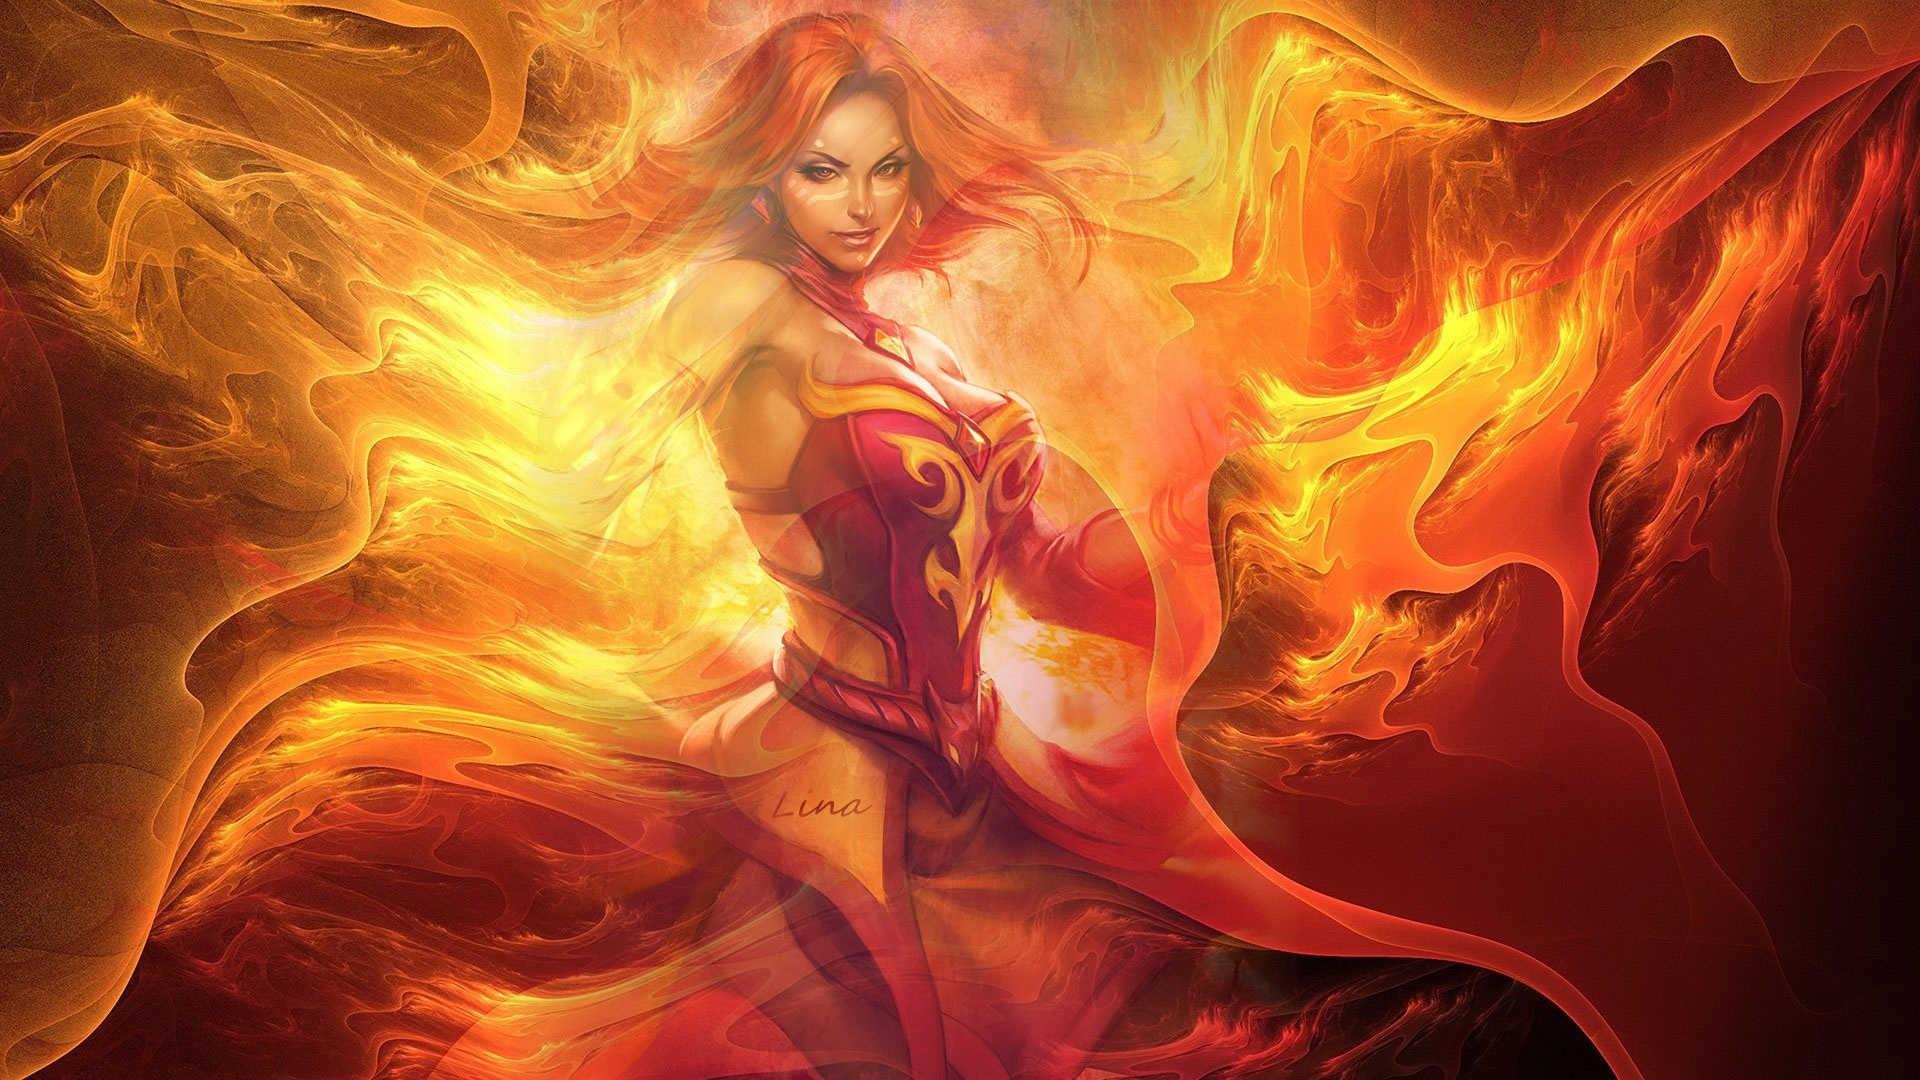 Ember Spirit Fury Of Flame Warrior – Dota 2 Wallpaper The